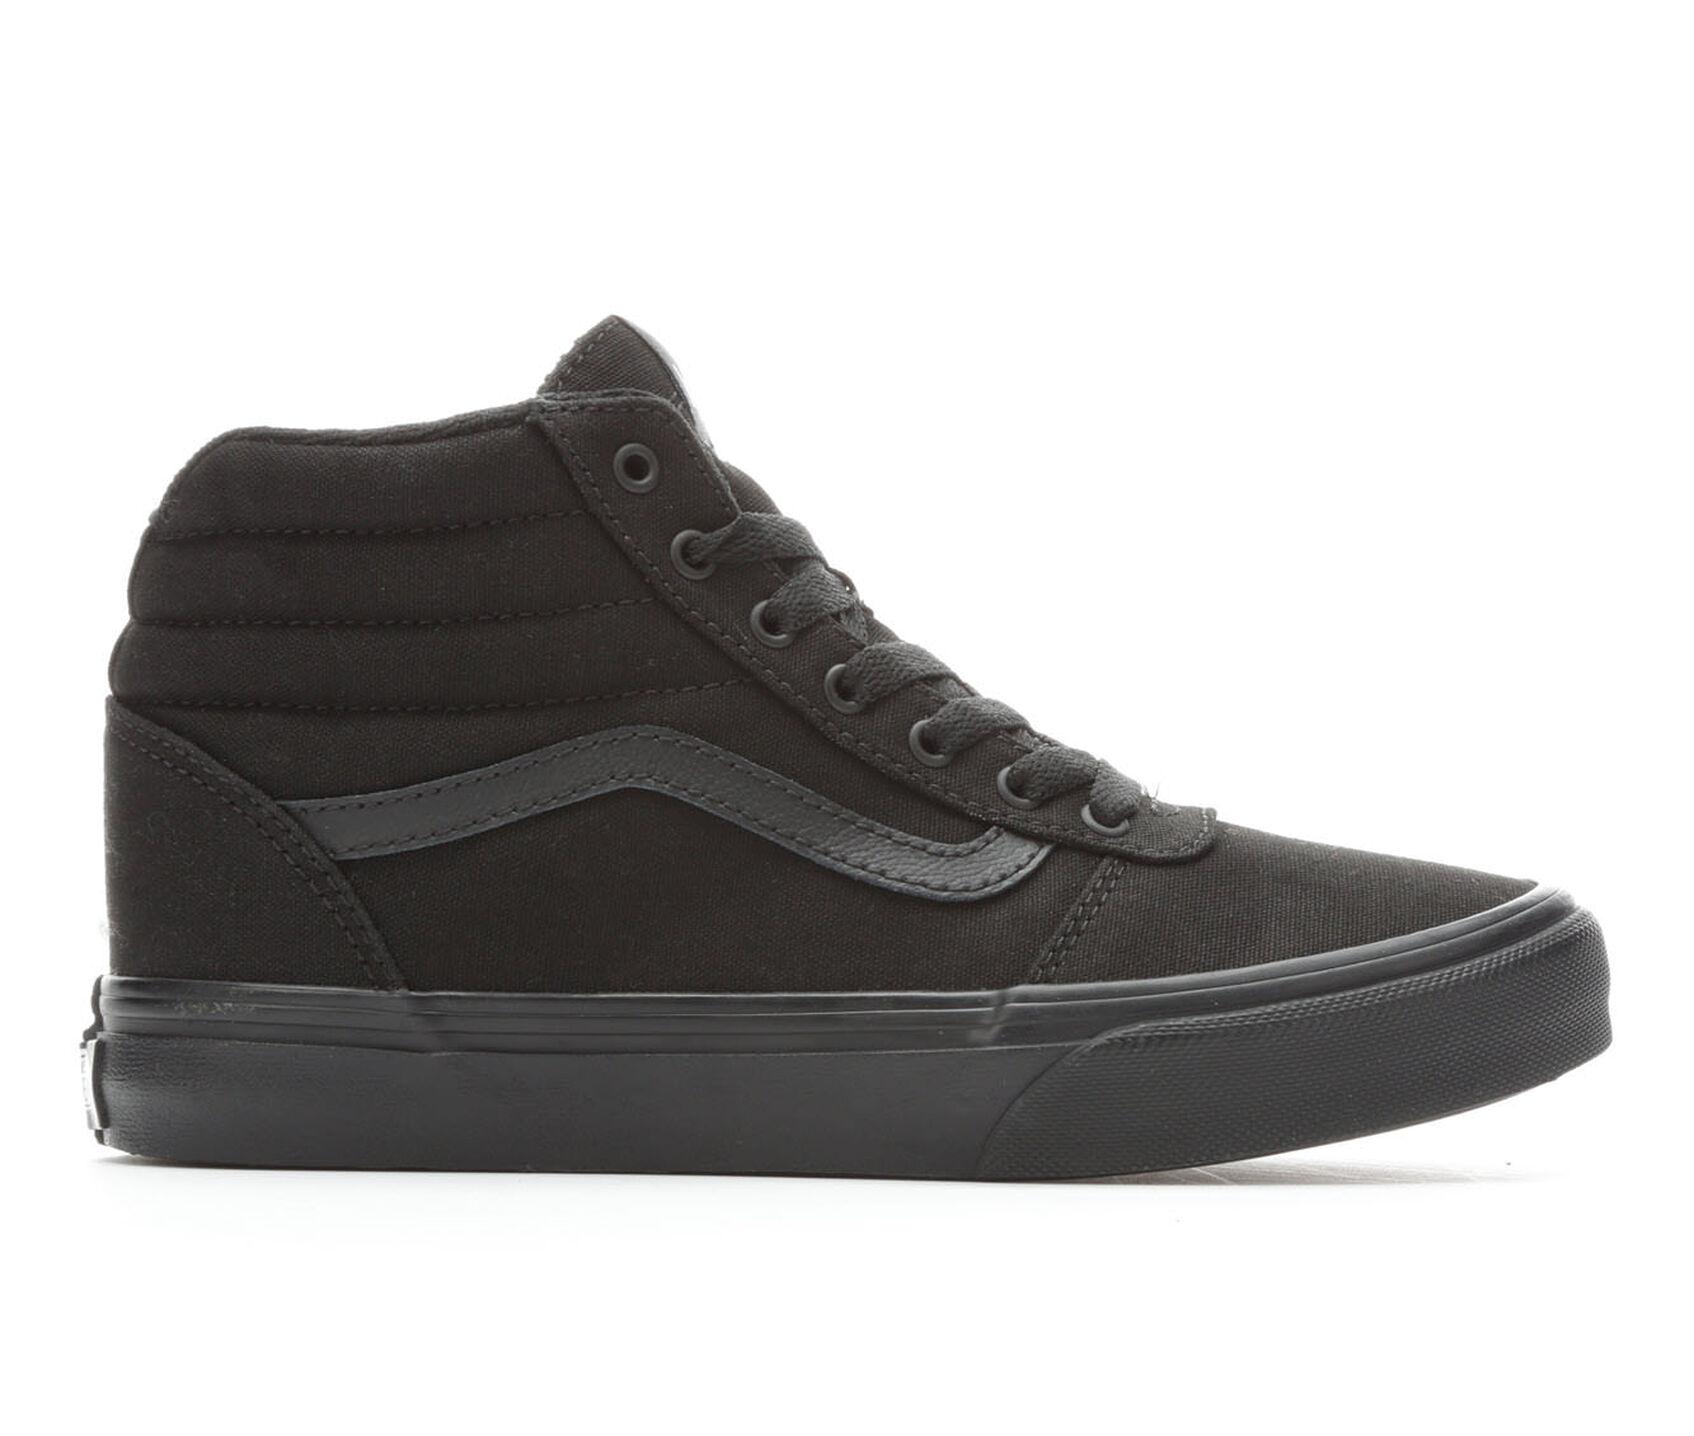 bab6ce52c225ba Kids  Vans Little Kid   Big Kid Ward Hi High Top Skate Shoes